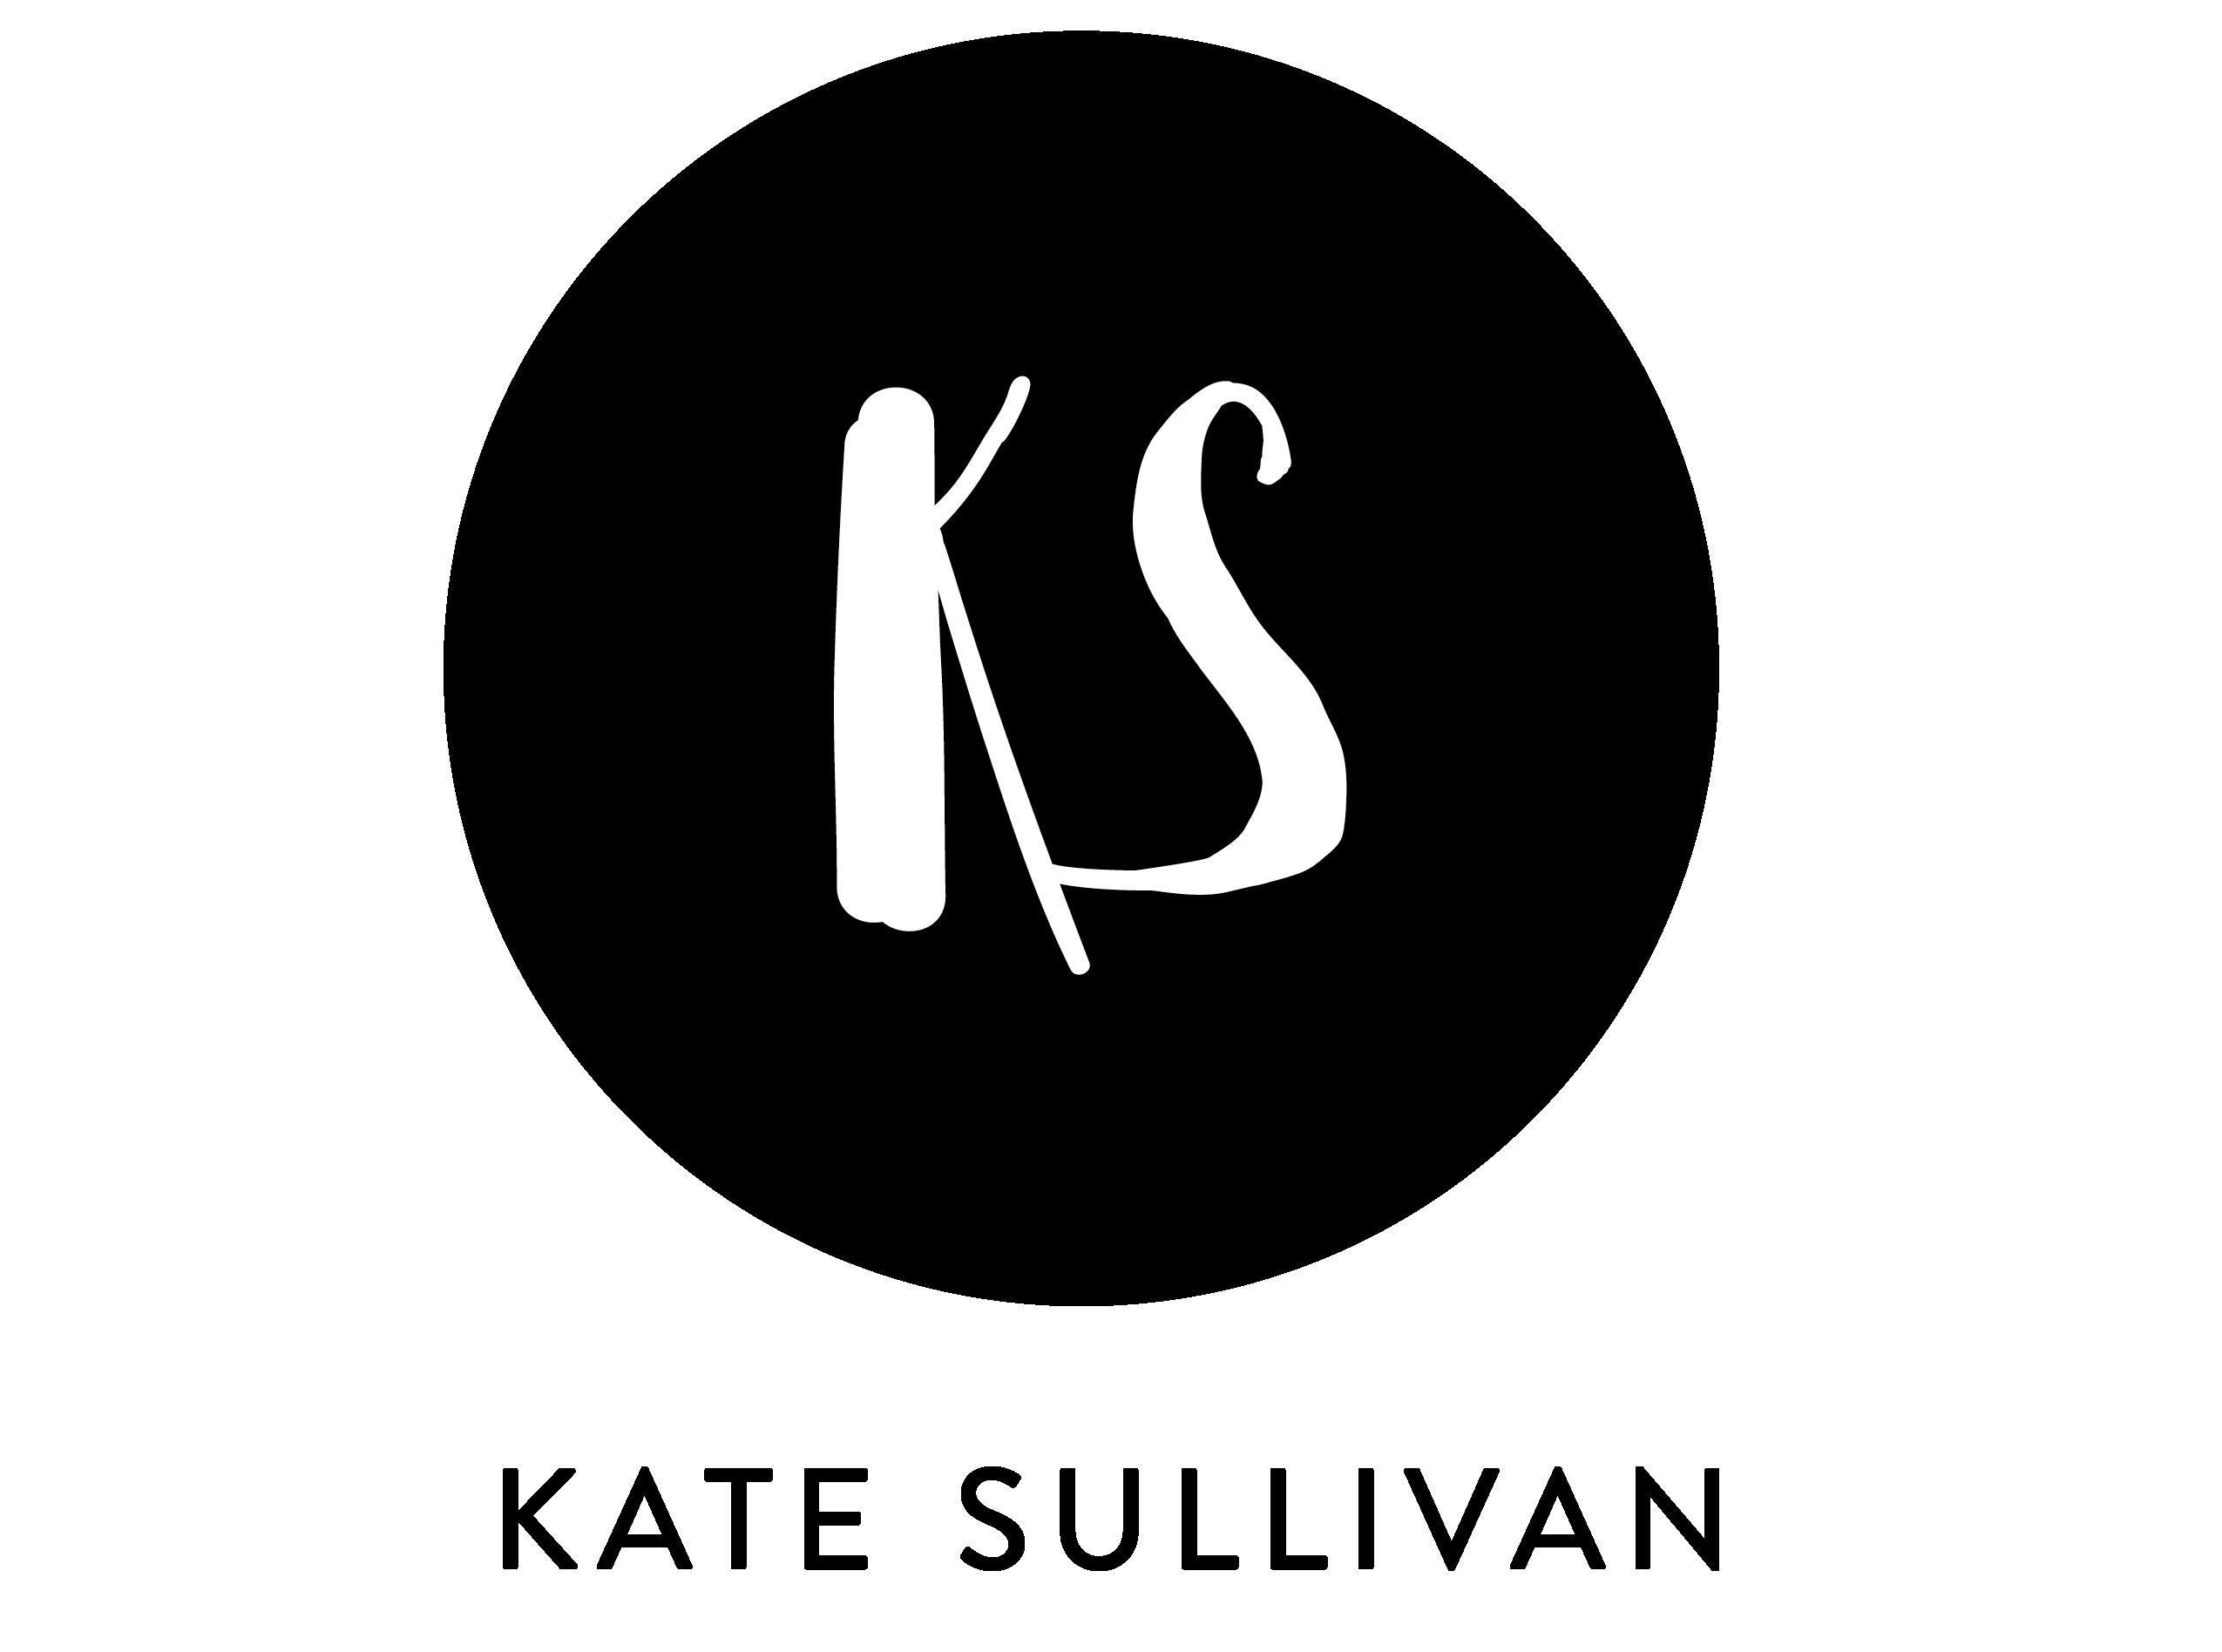 Katelyn Sullivan